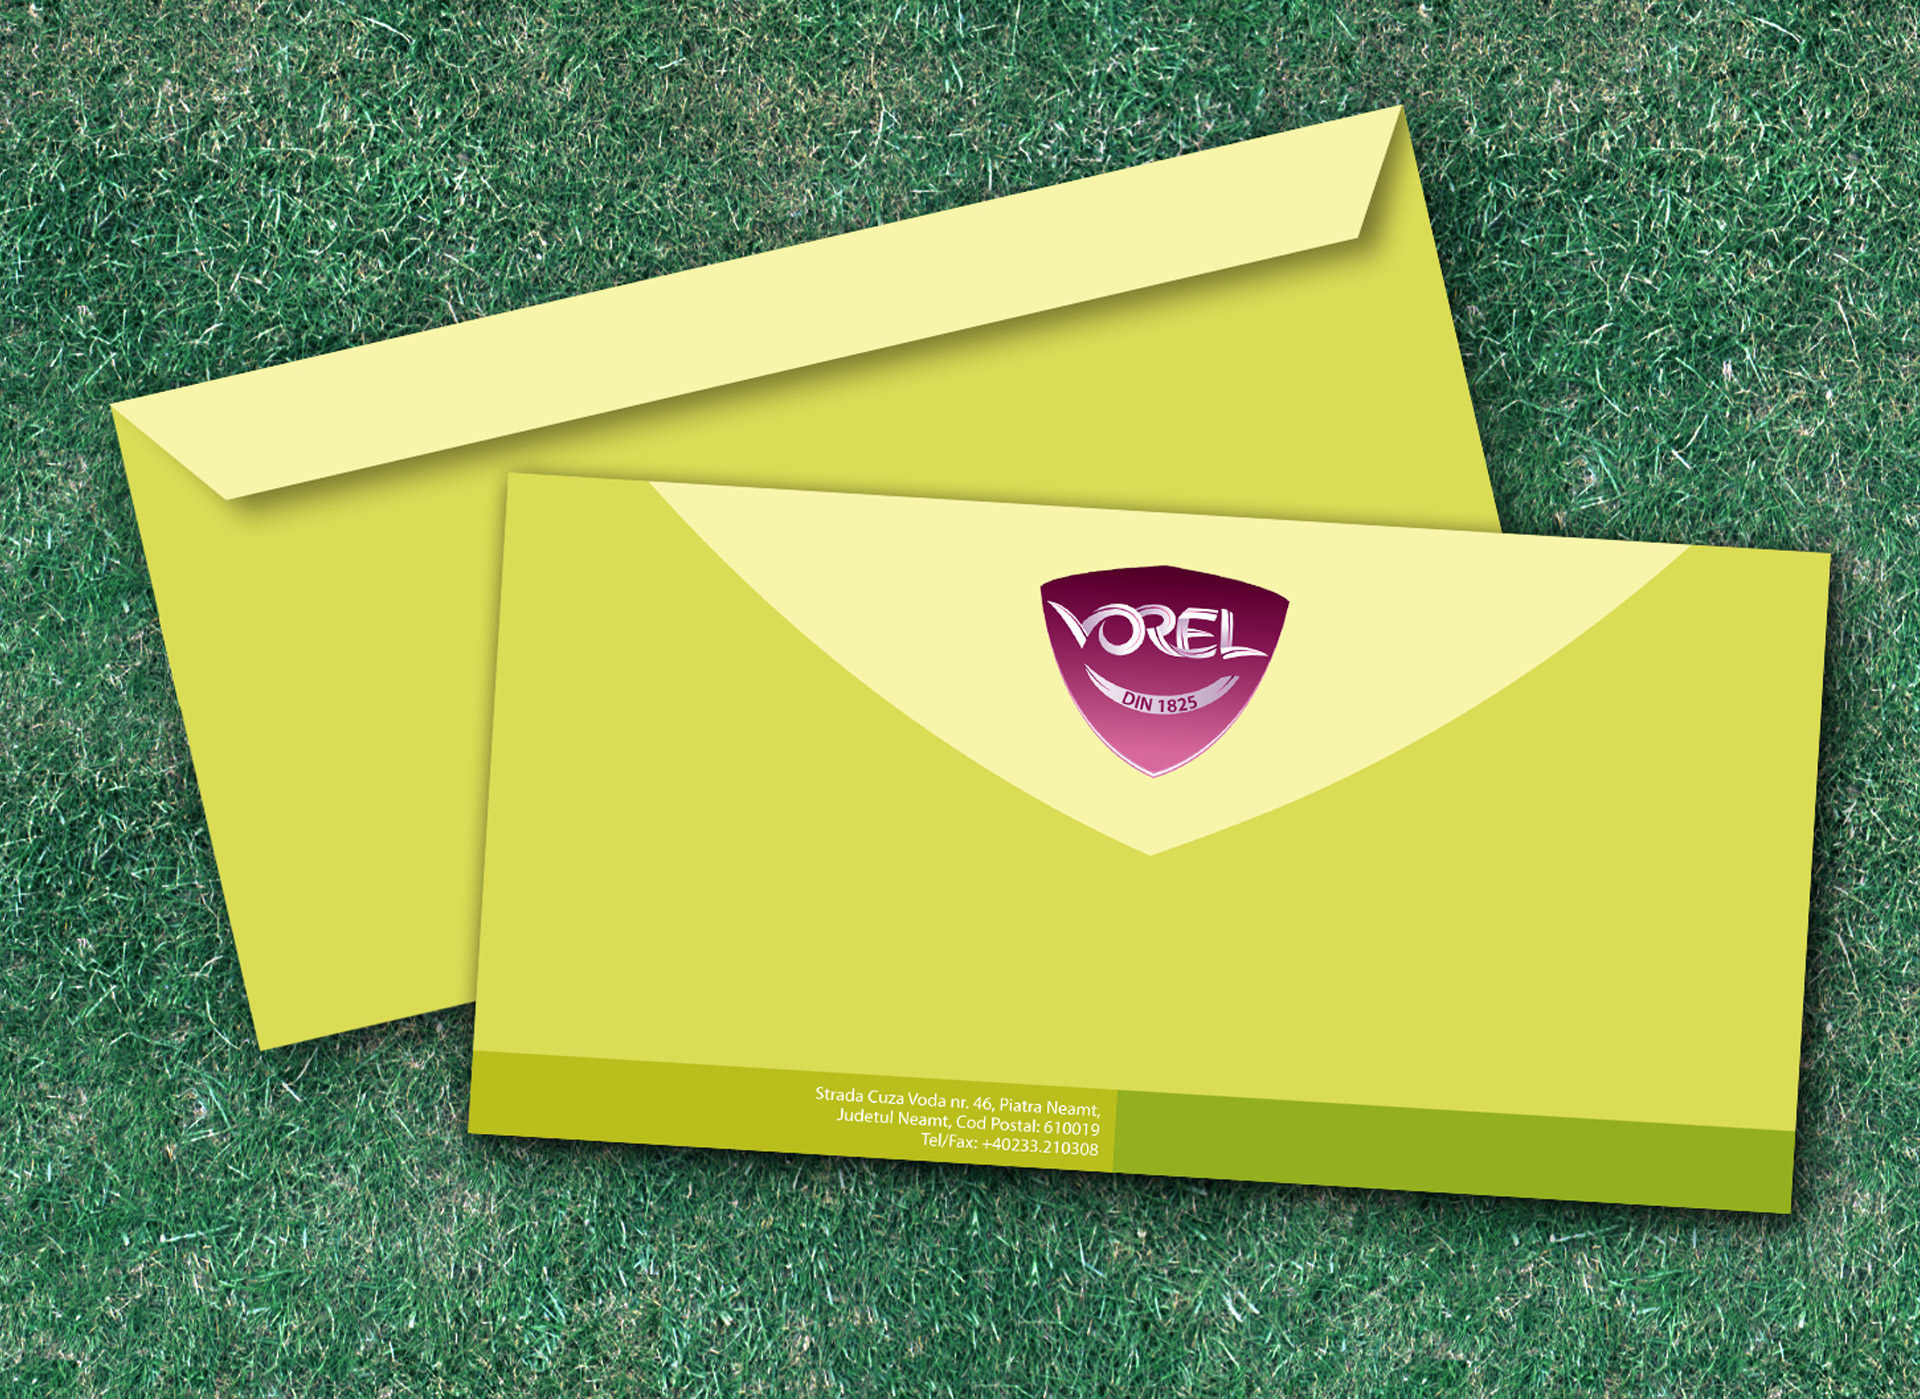 laboratoarele vorel inoveo portfoliu envelope design